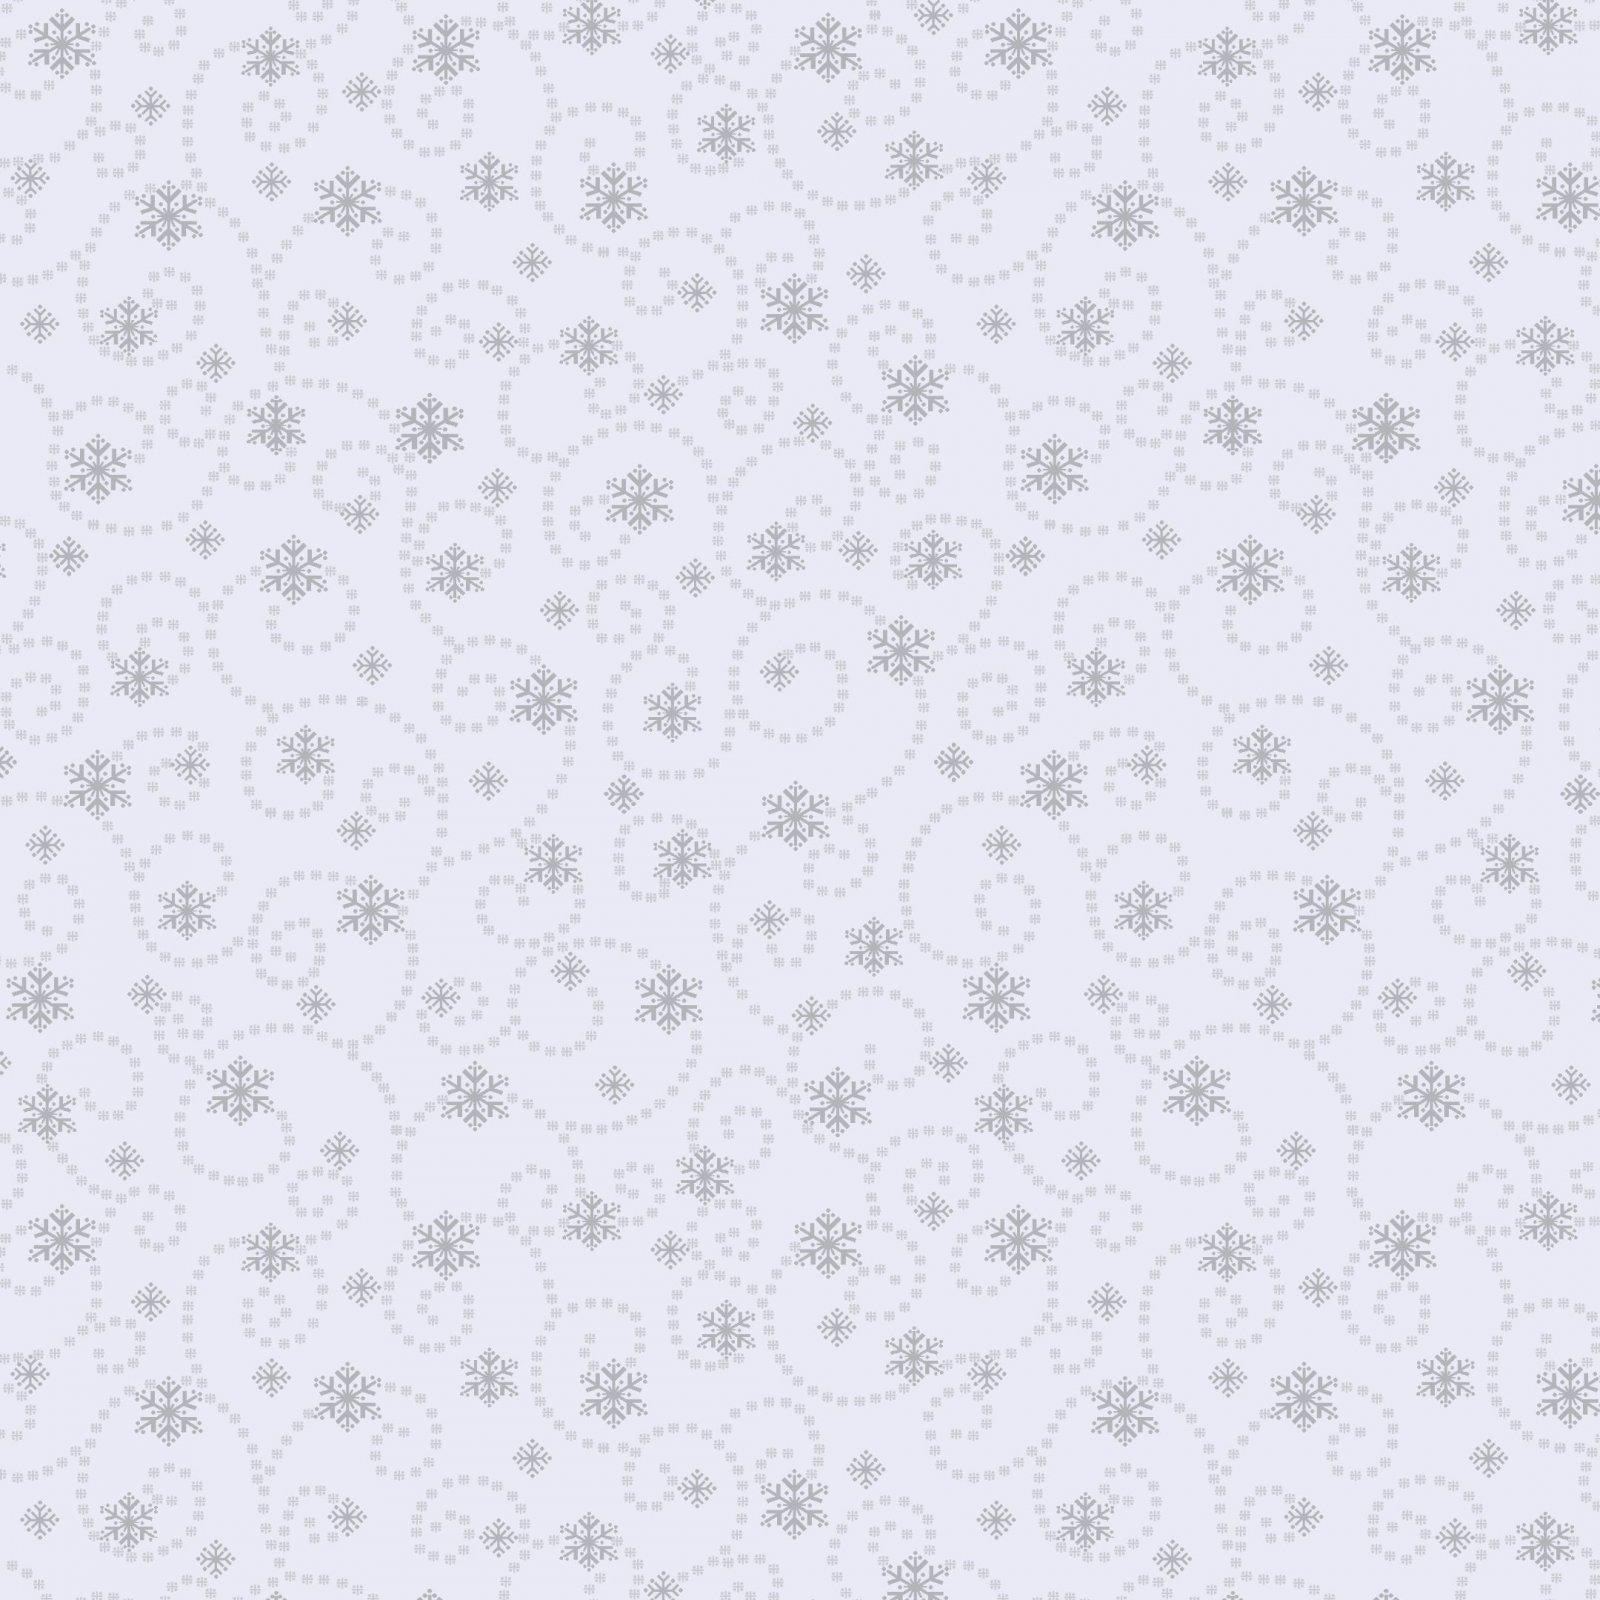 SE-Cream & Sugar X 6107-90 Gray - Snowflake